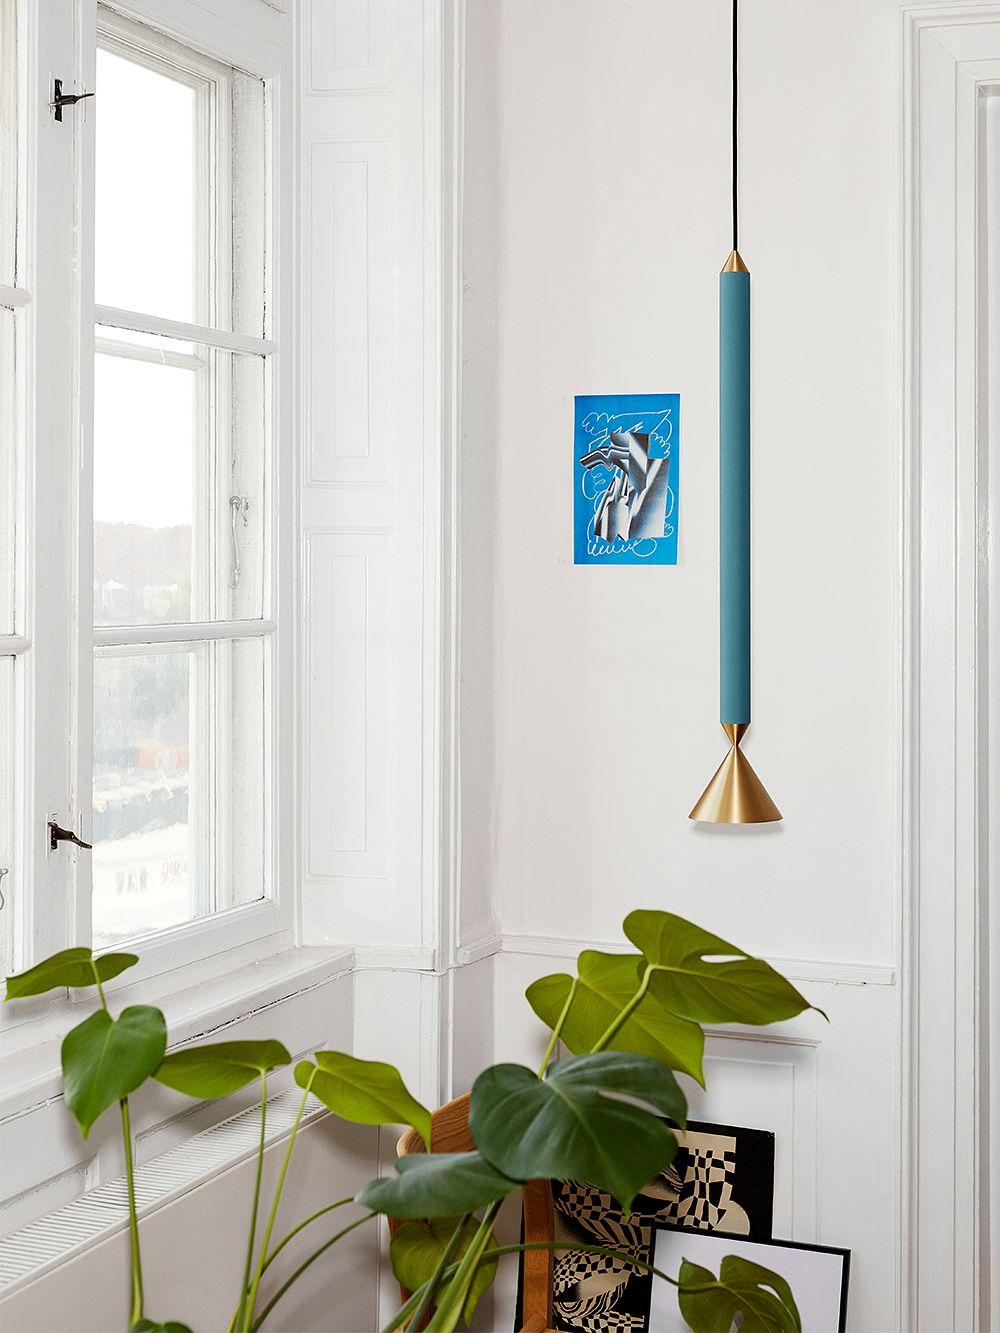 Apollo pendant by Pholc